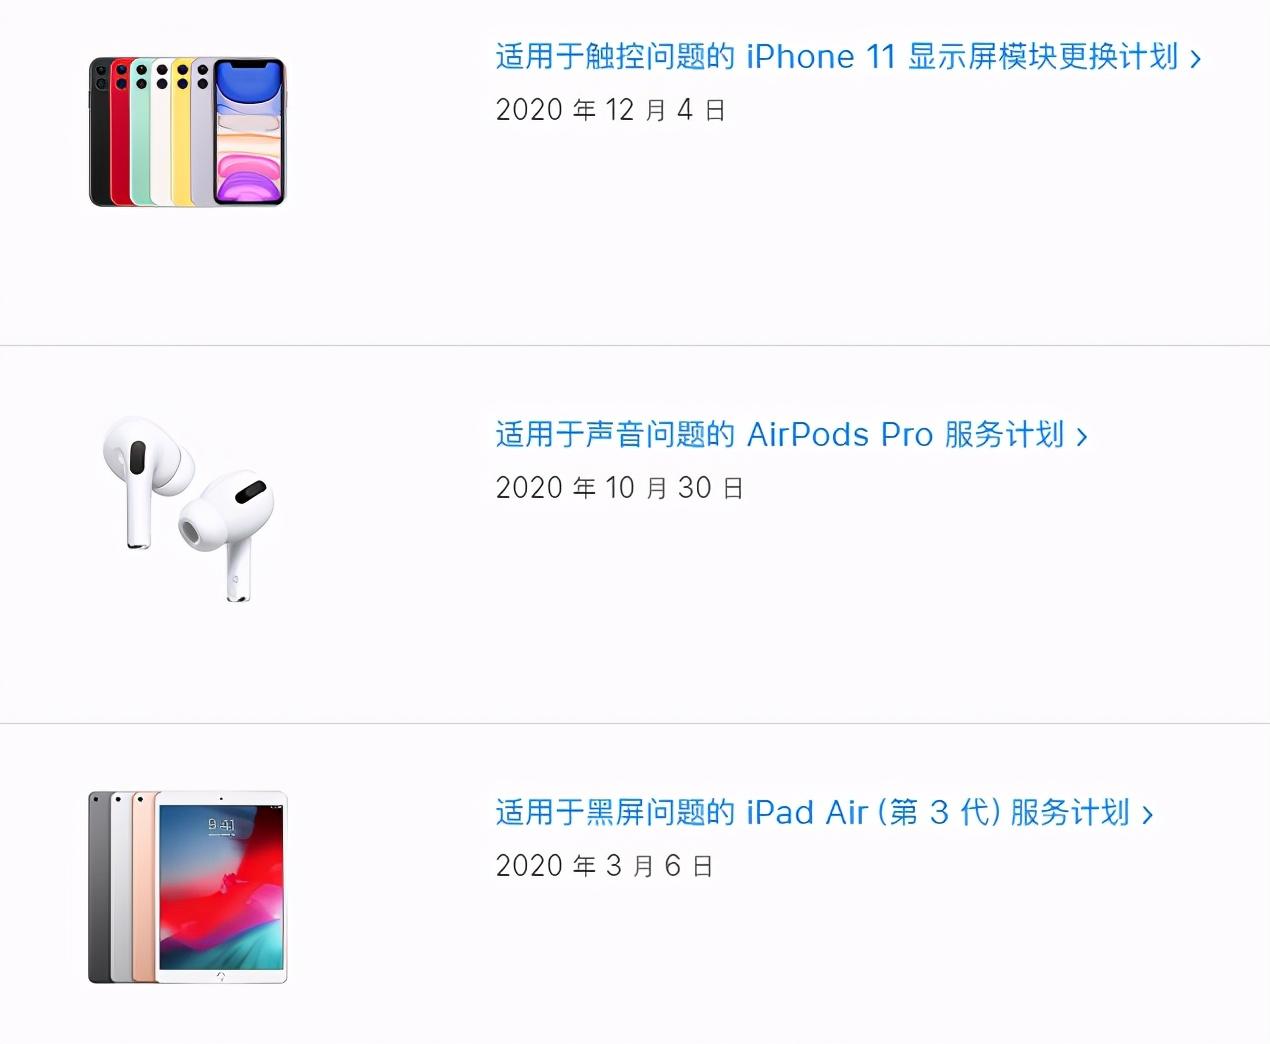 iPhone大翻车!苹果正在全球紧急召回